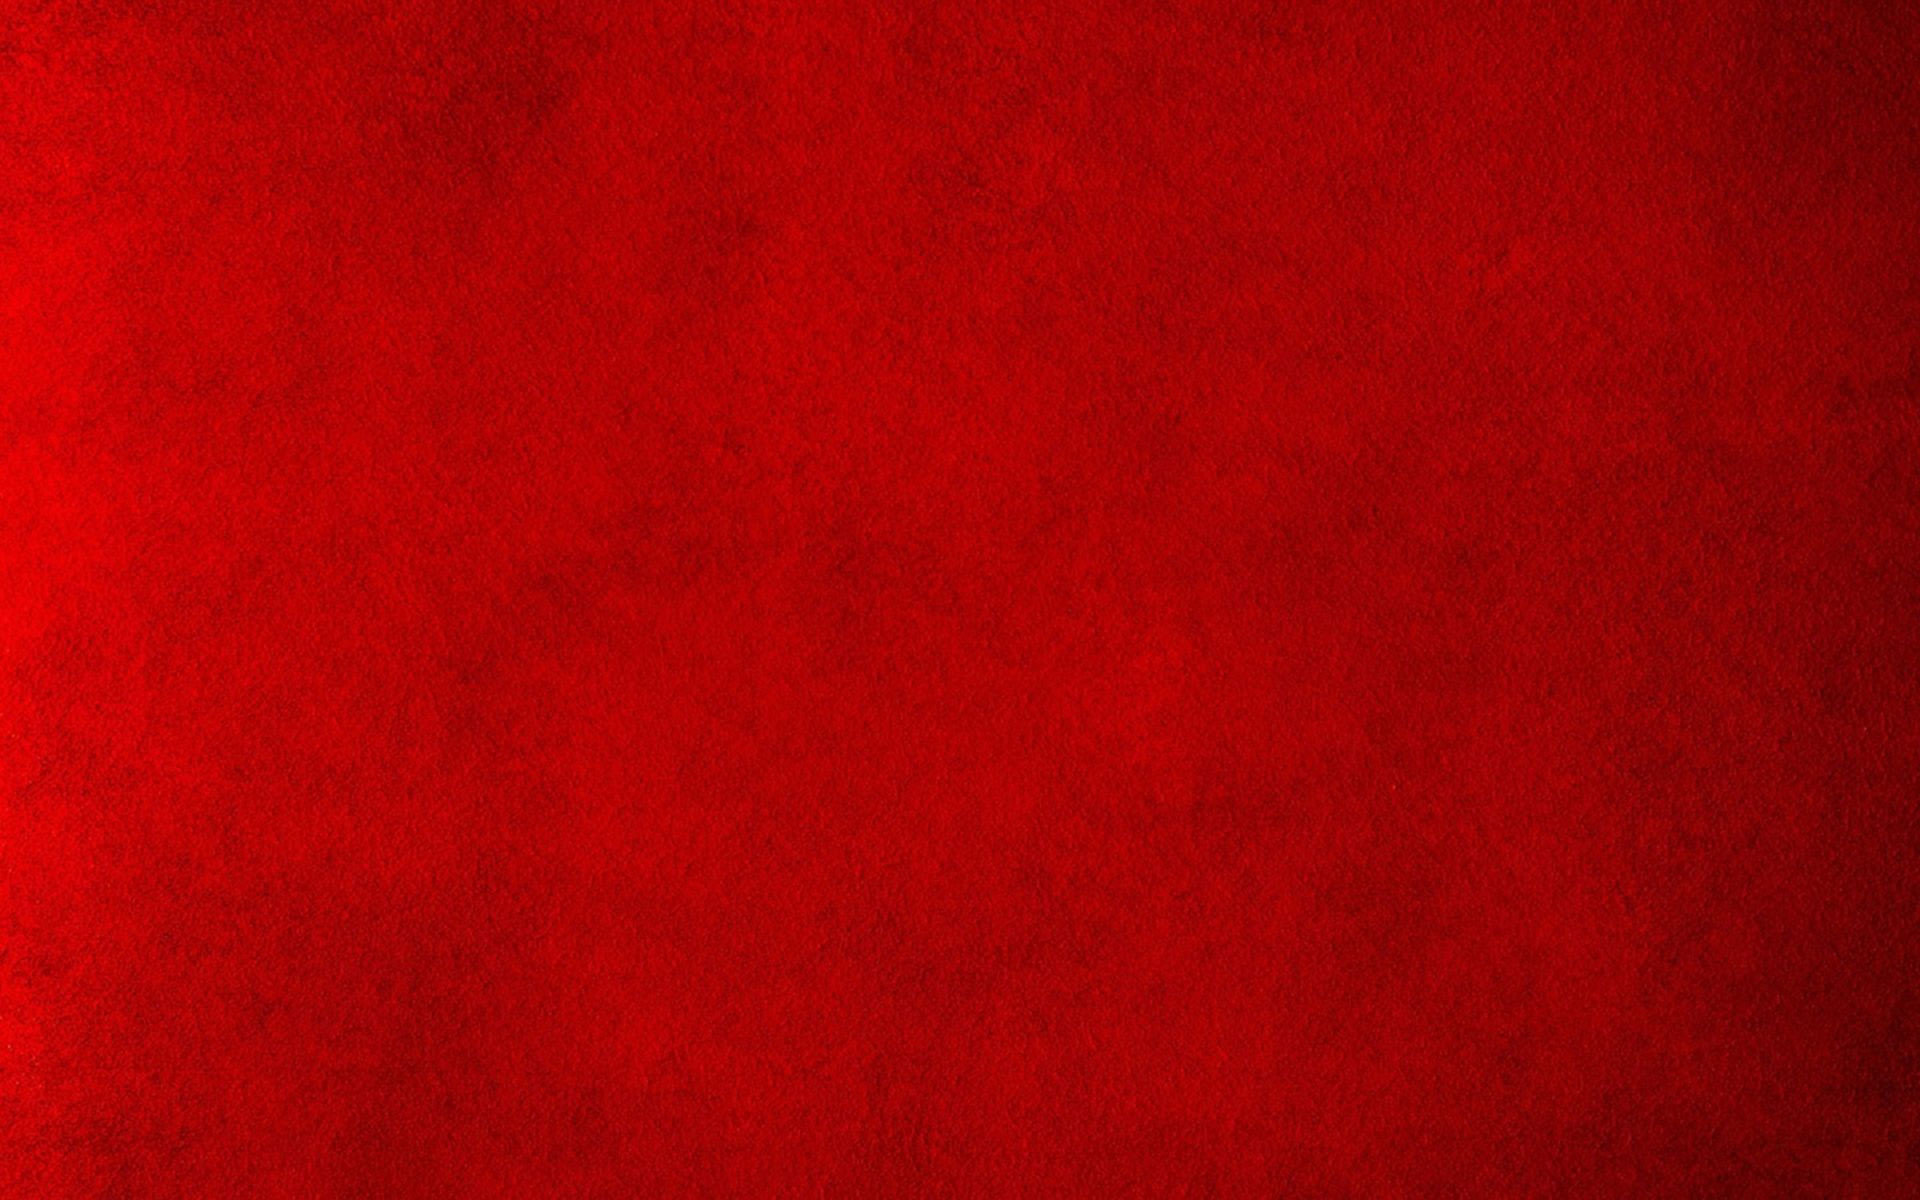 Red Wallpaper 29